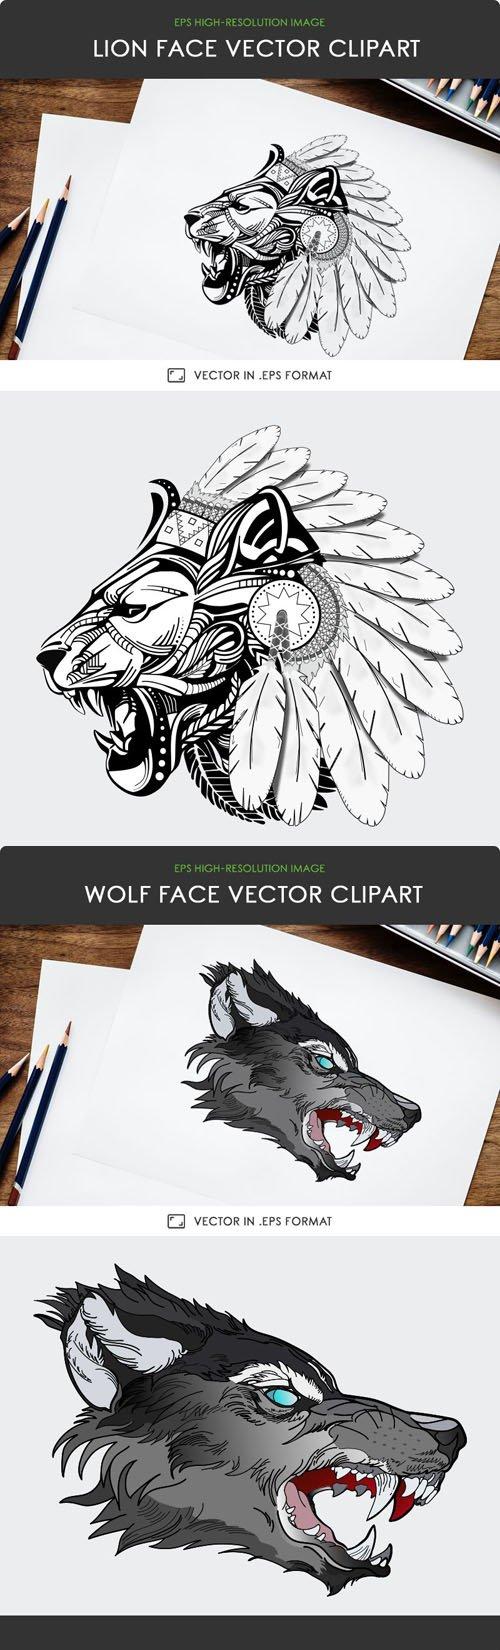 Lion & Wolf Face Vector Clipart